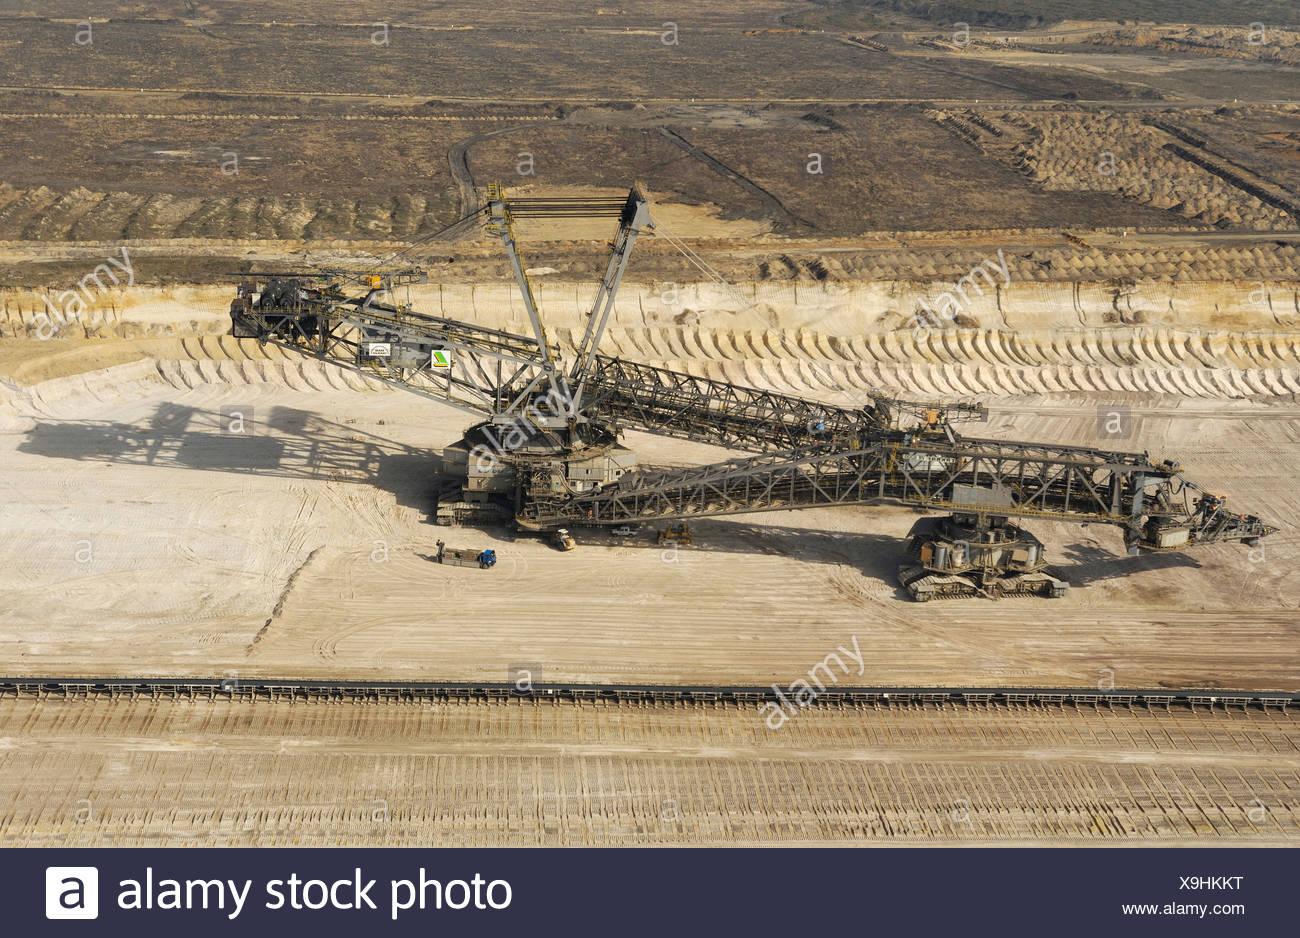 Bucket-wheel excavator used for surface mining Stock Photo